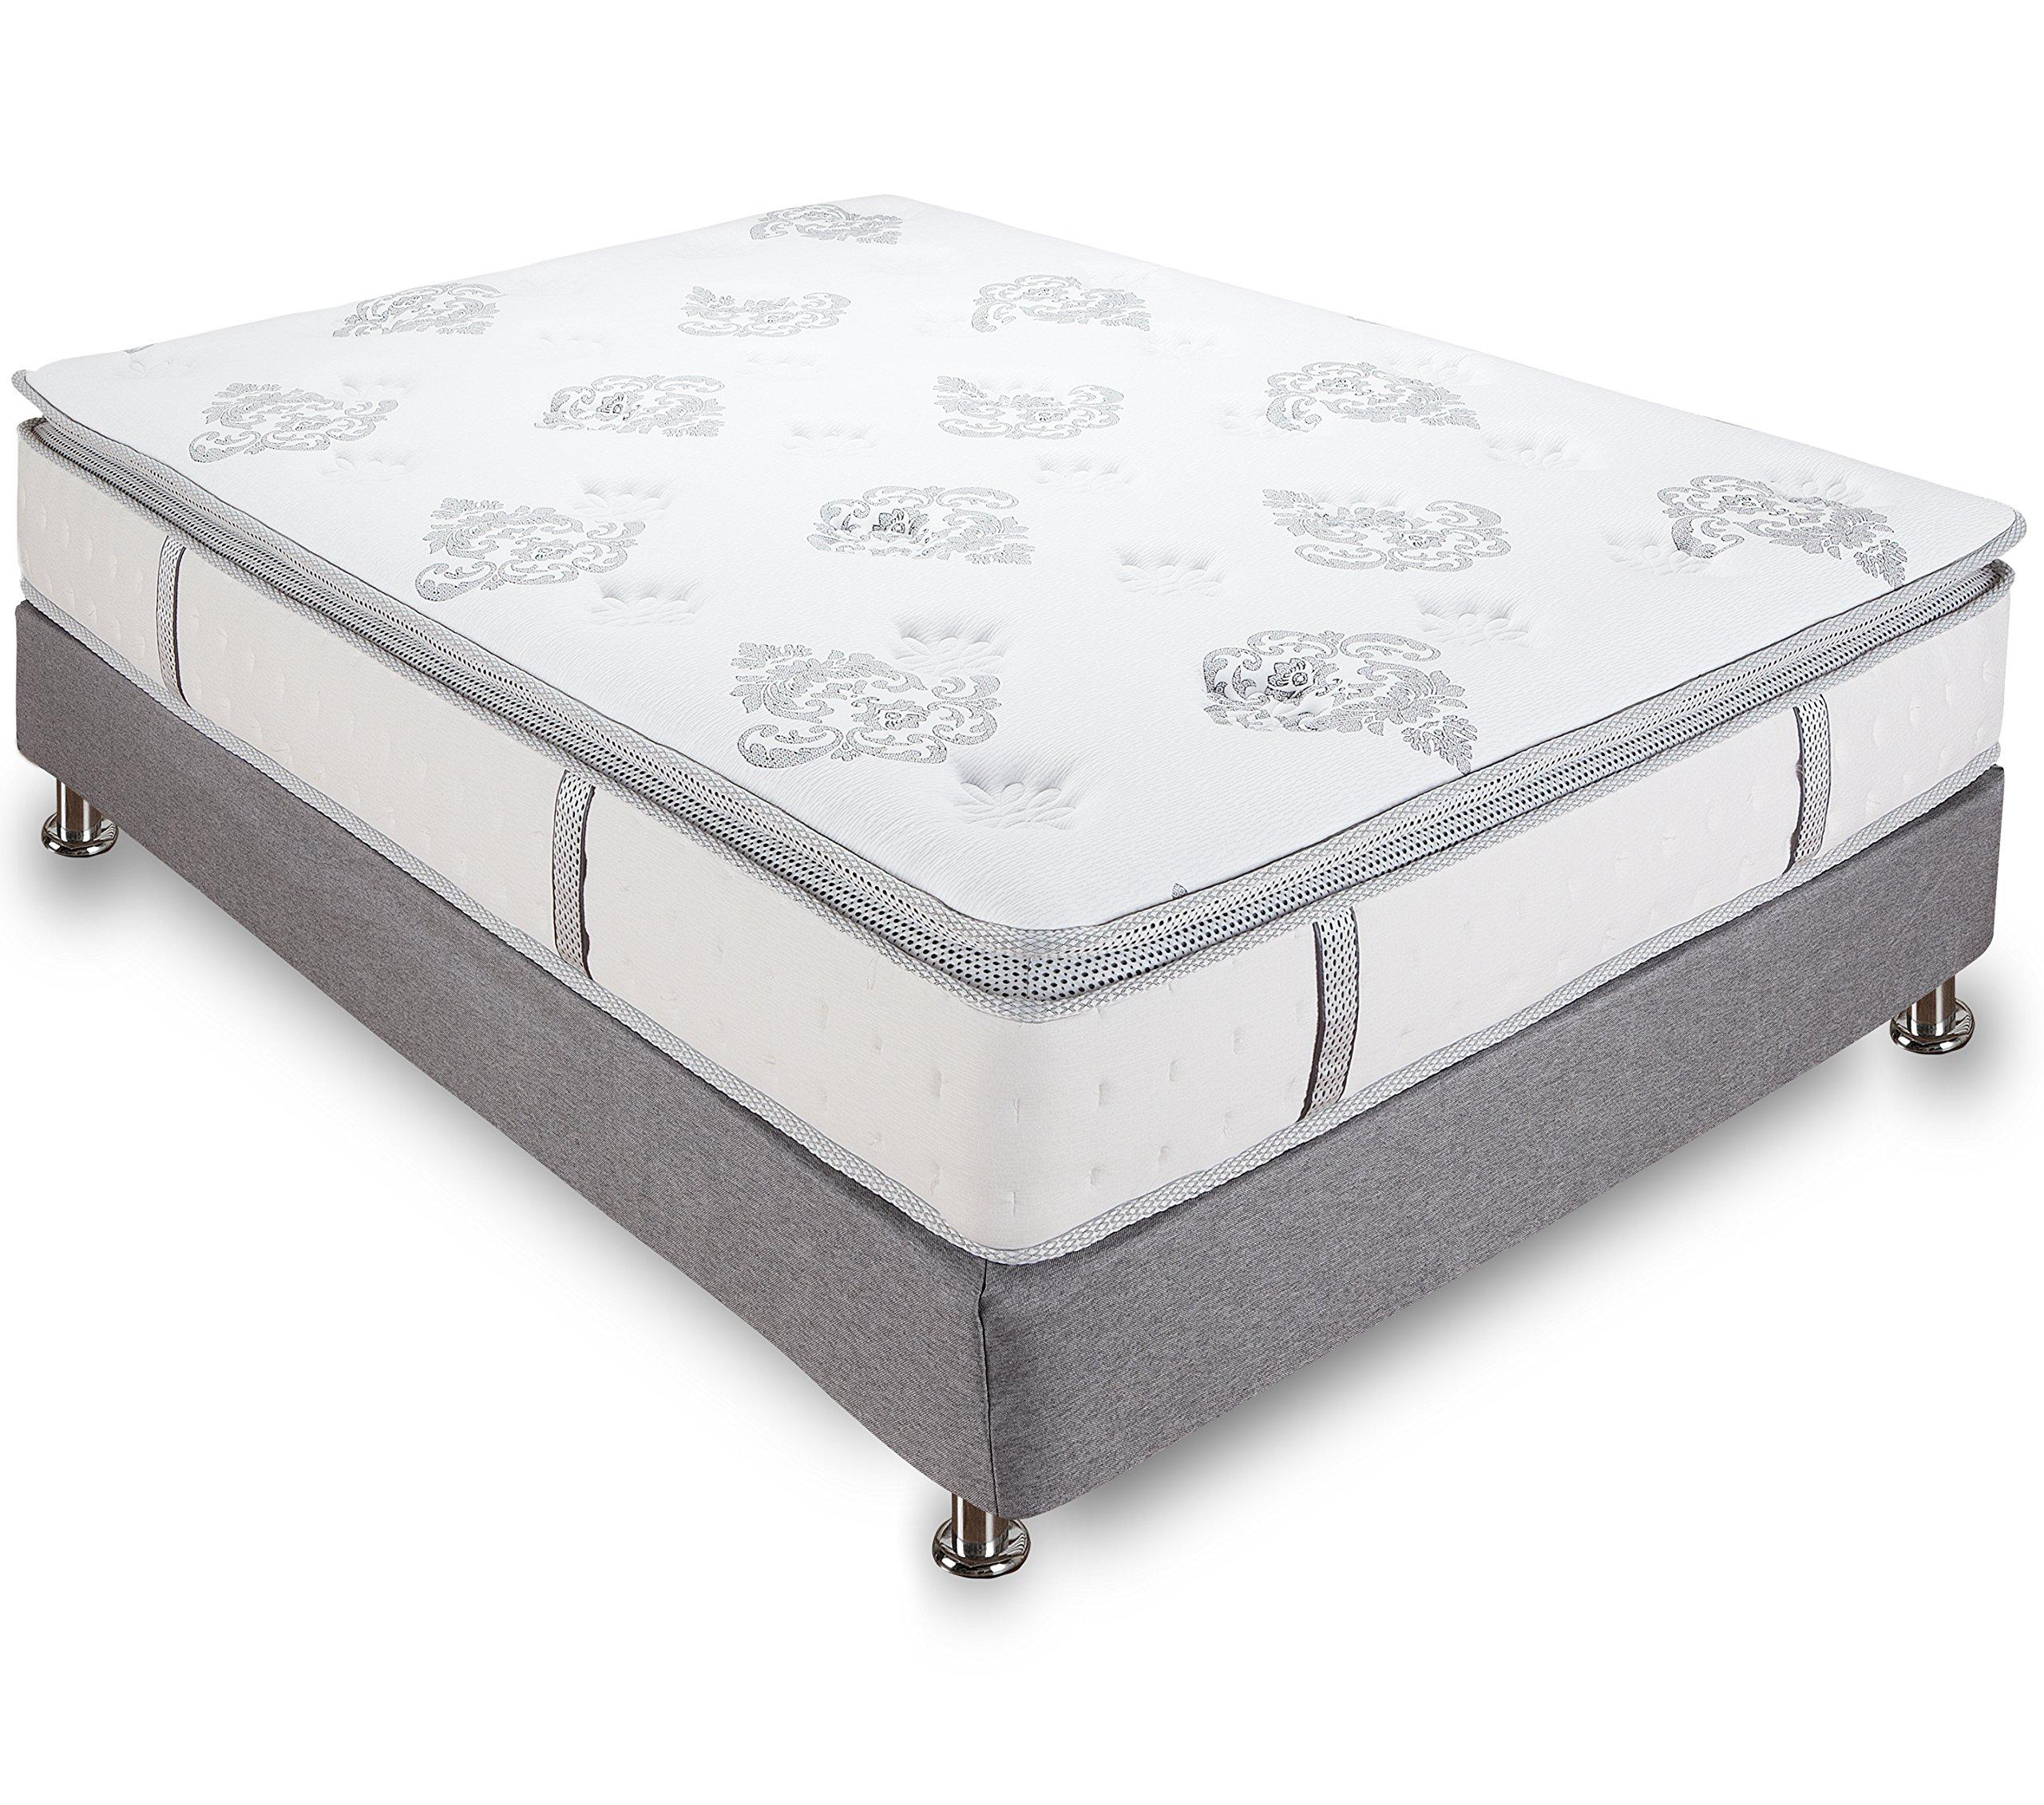 Classic Brands Mercer Pillow-Top Cool Gel Memory Foam and Innerspring Hybrid 12-Inch Mattress, Full